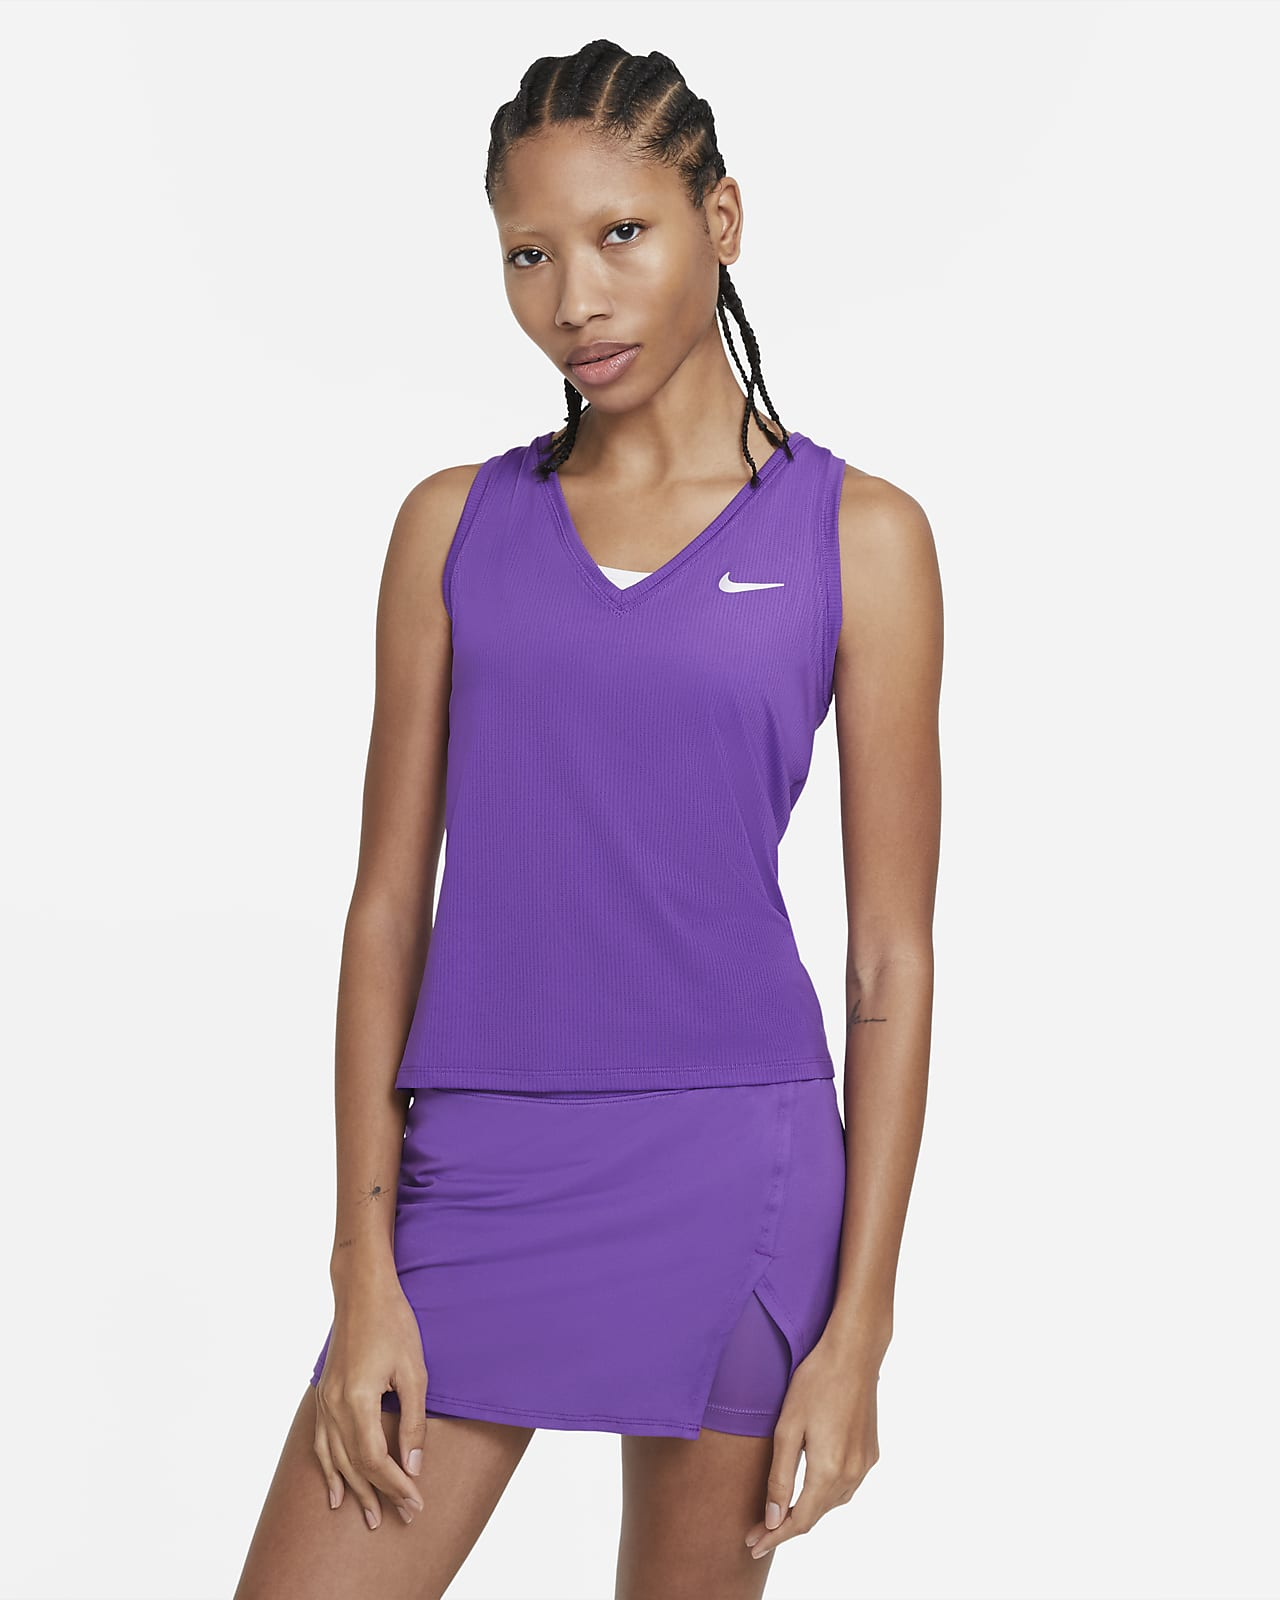 Canotta da tennis NikeCourt Victory - Donna